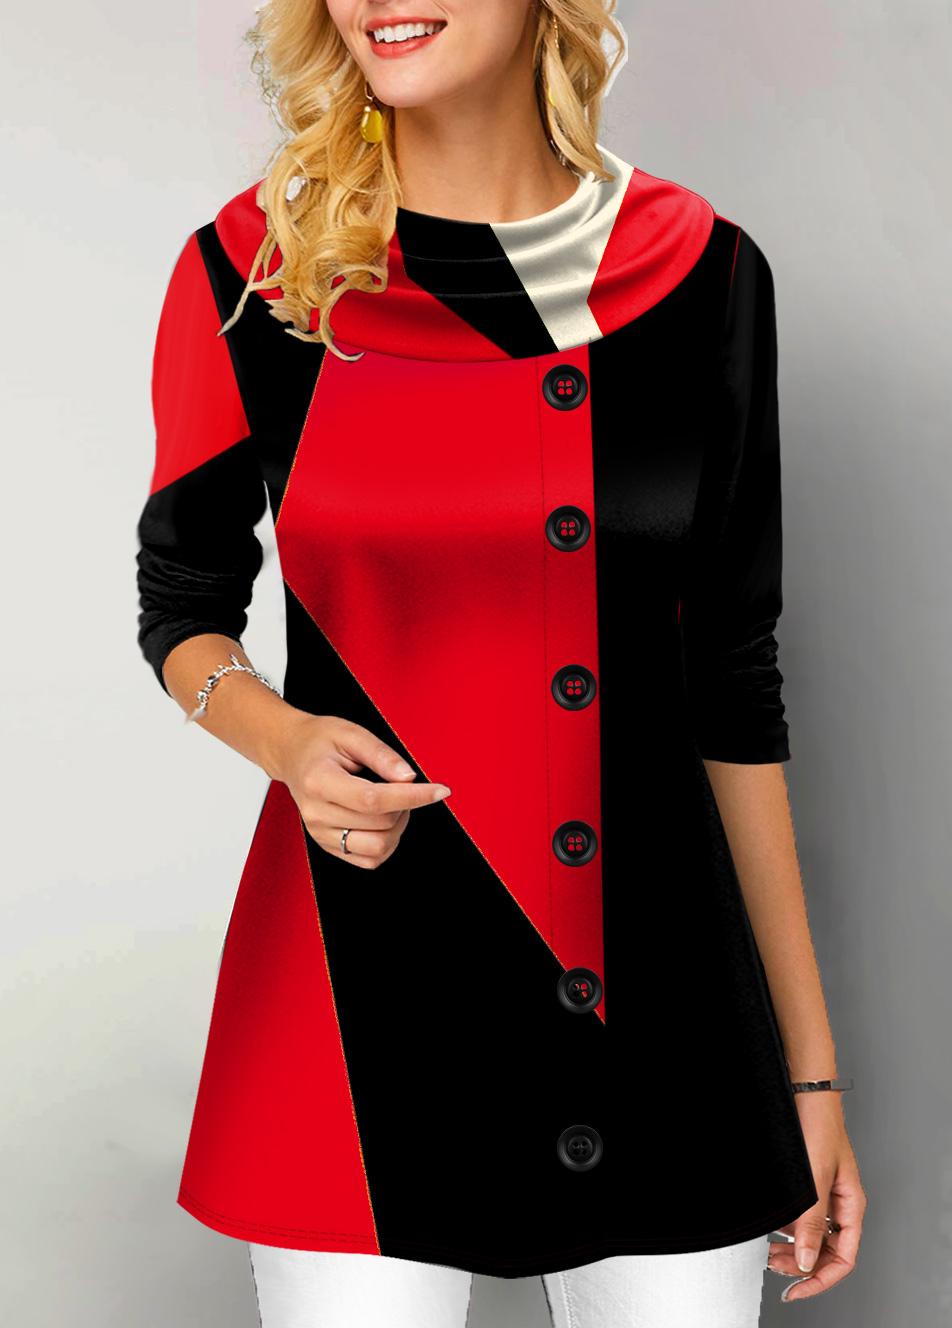 ROTITA Button Detail Contrast Long Sleeve Tunic Top